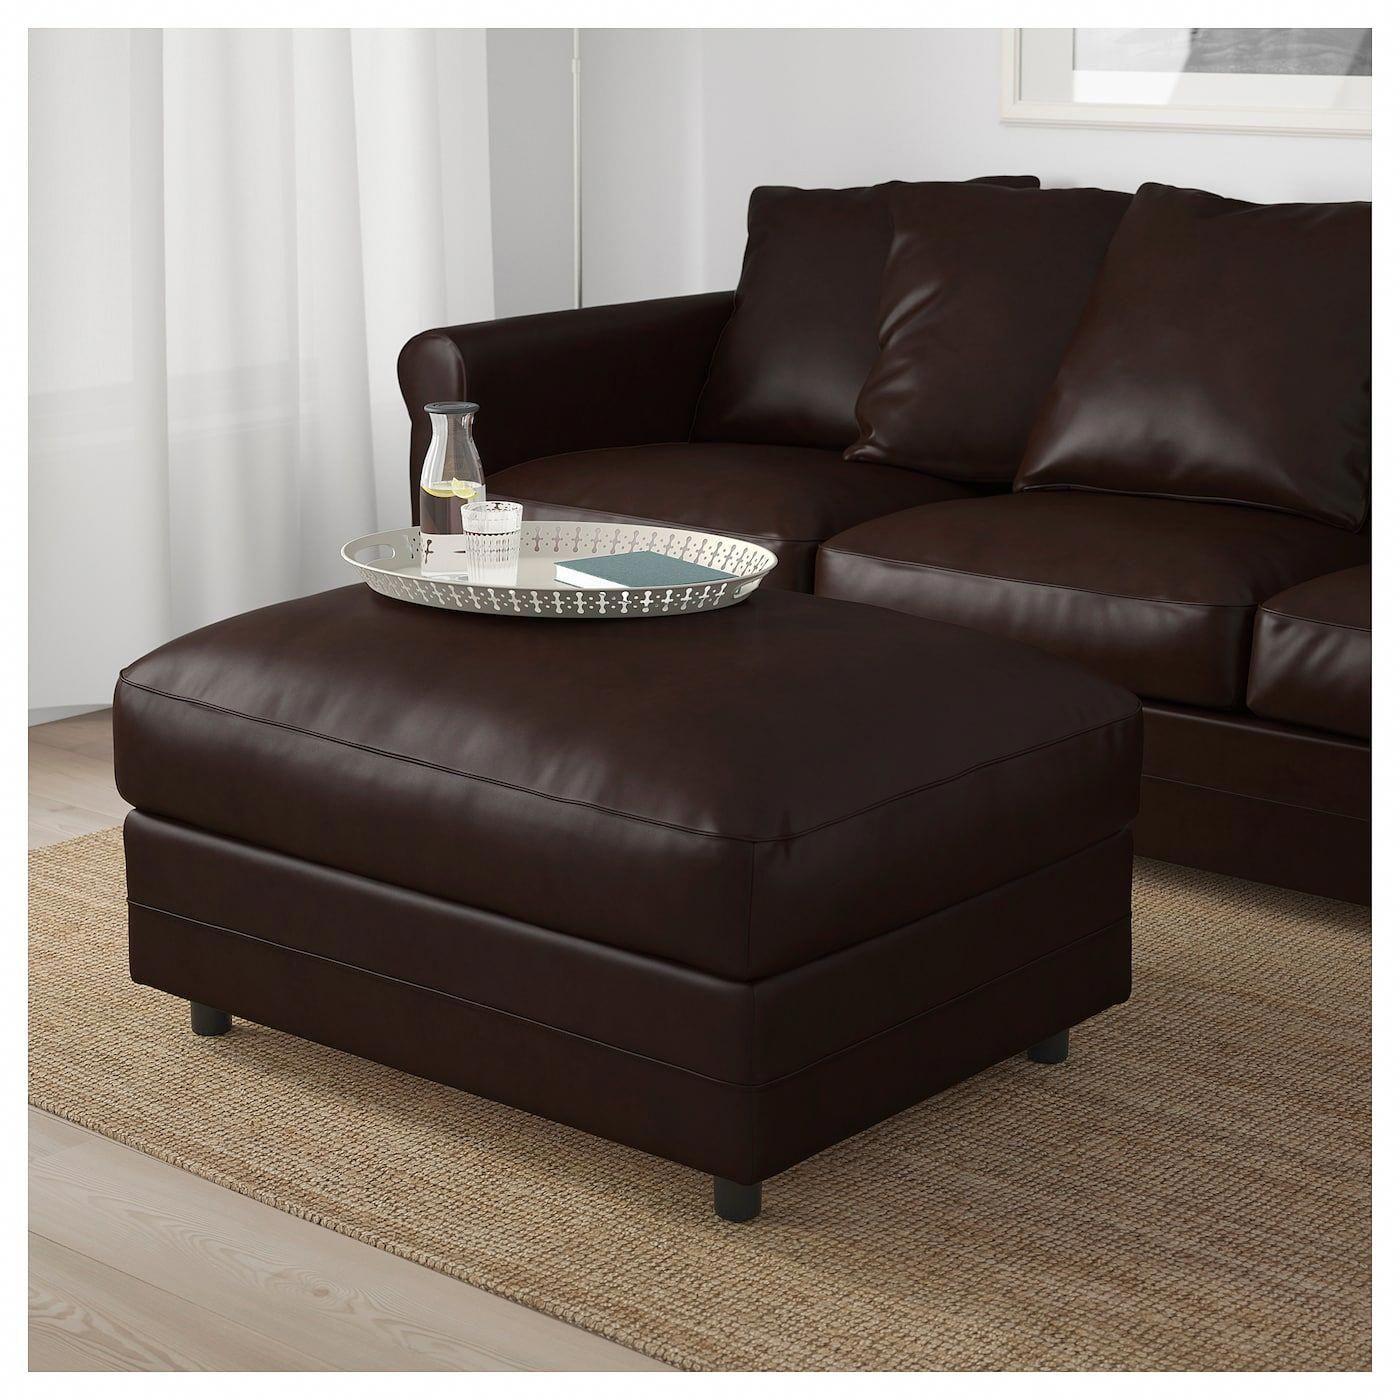 IKEA GRÖNLID Footstool with storage Kimstad dark brown